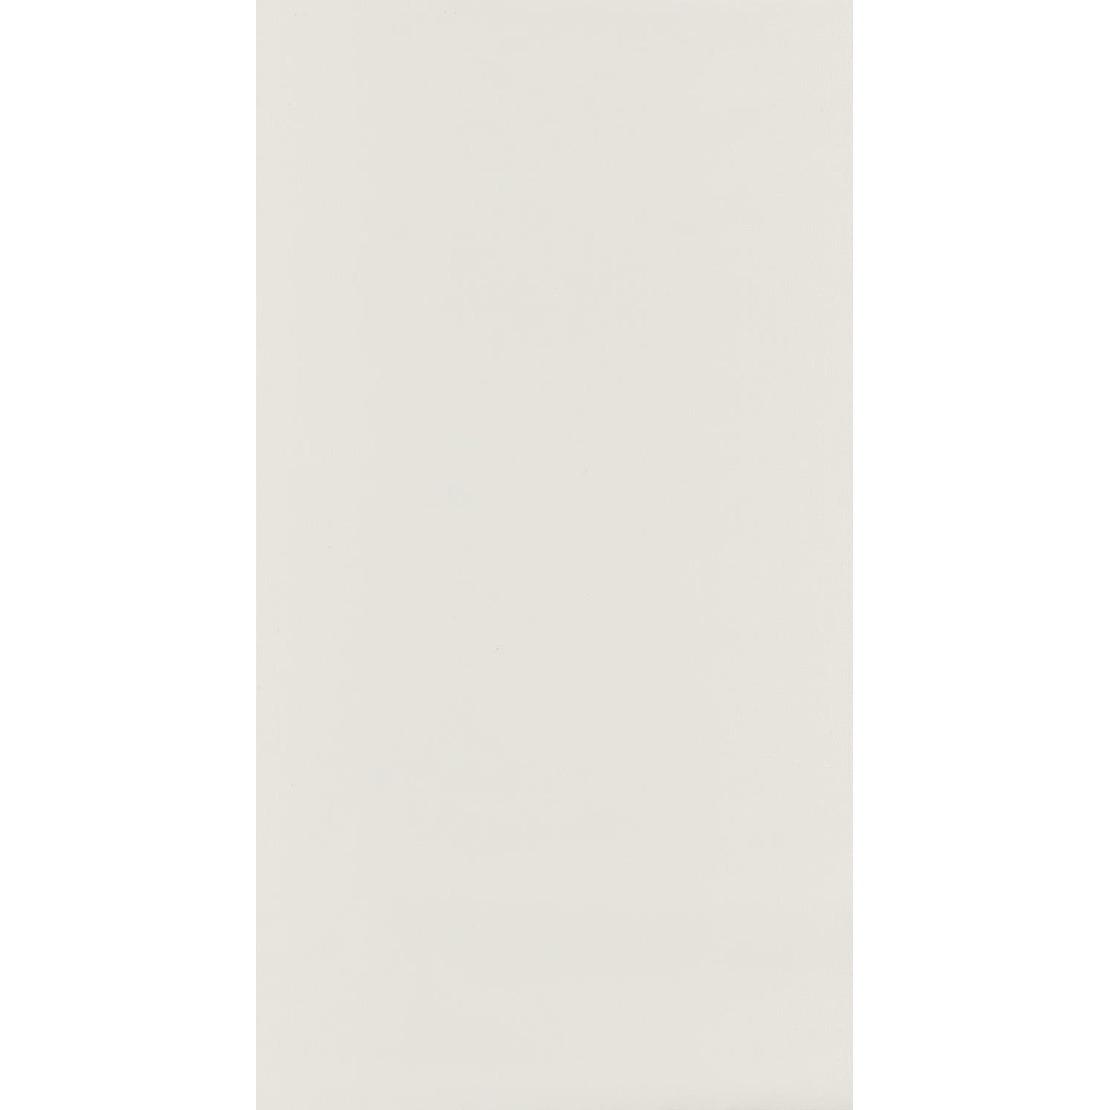 Французские обои Casadeco,  коллекция Baltic, артикулBTI25030127